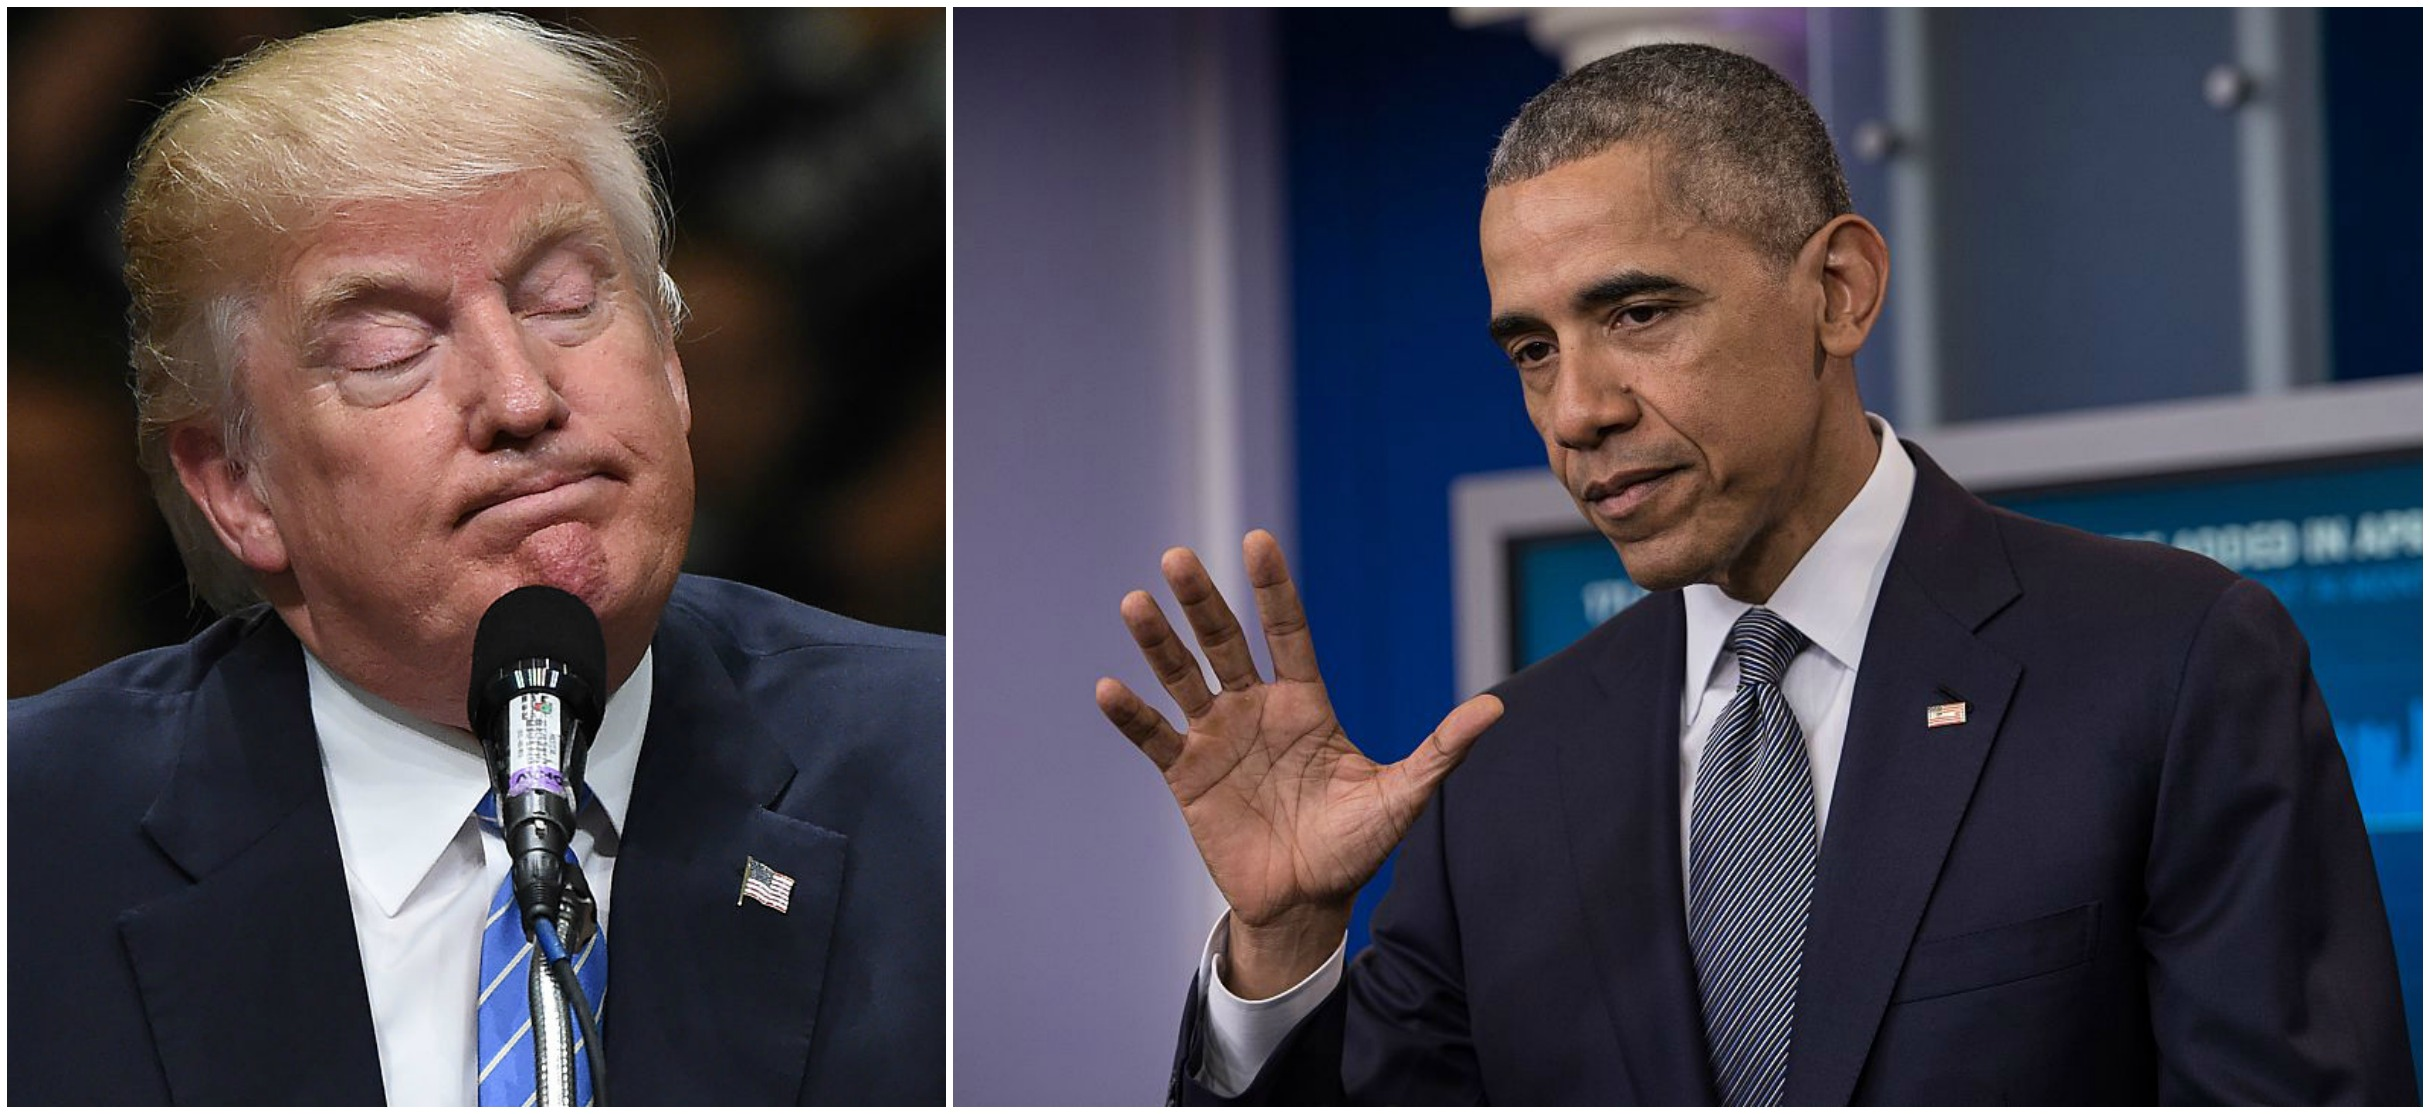 Donald Trump cere Congresului sa ancheteze daca Barack Obama a ordonat eventuale interceptari la Trump Tower